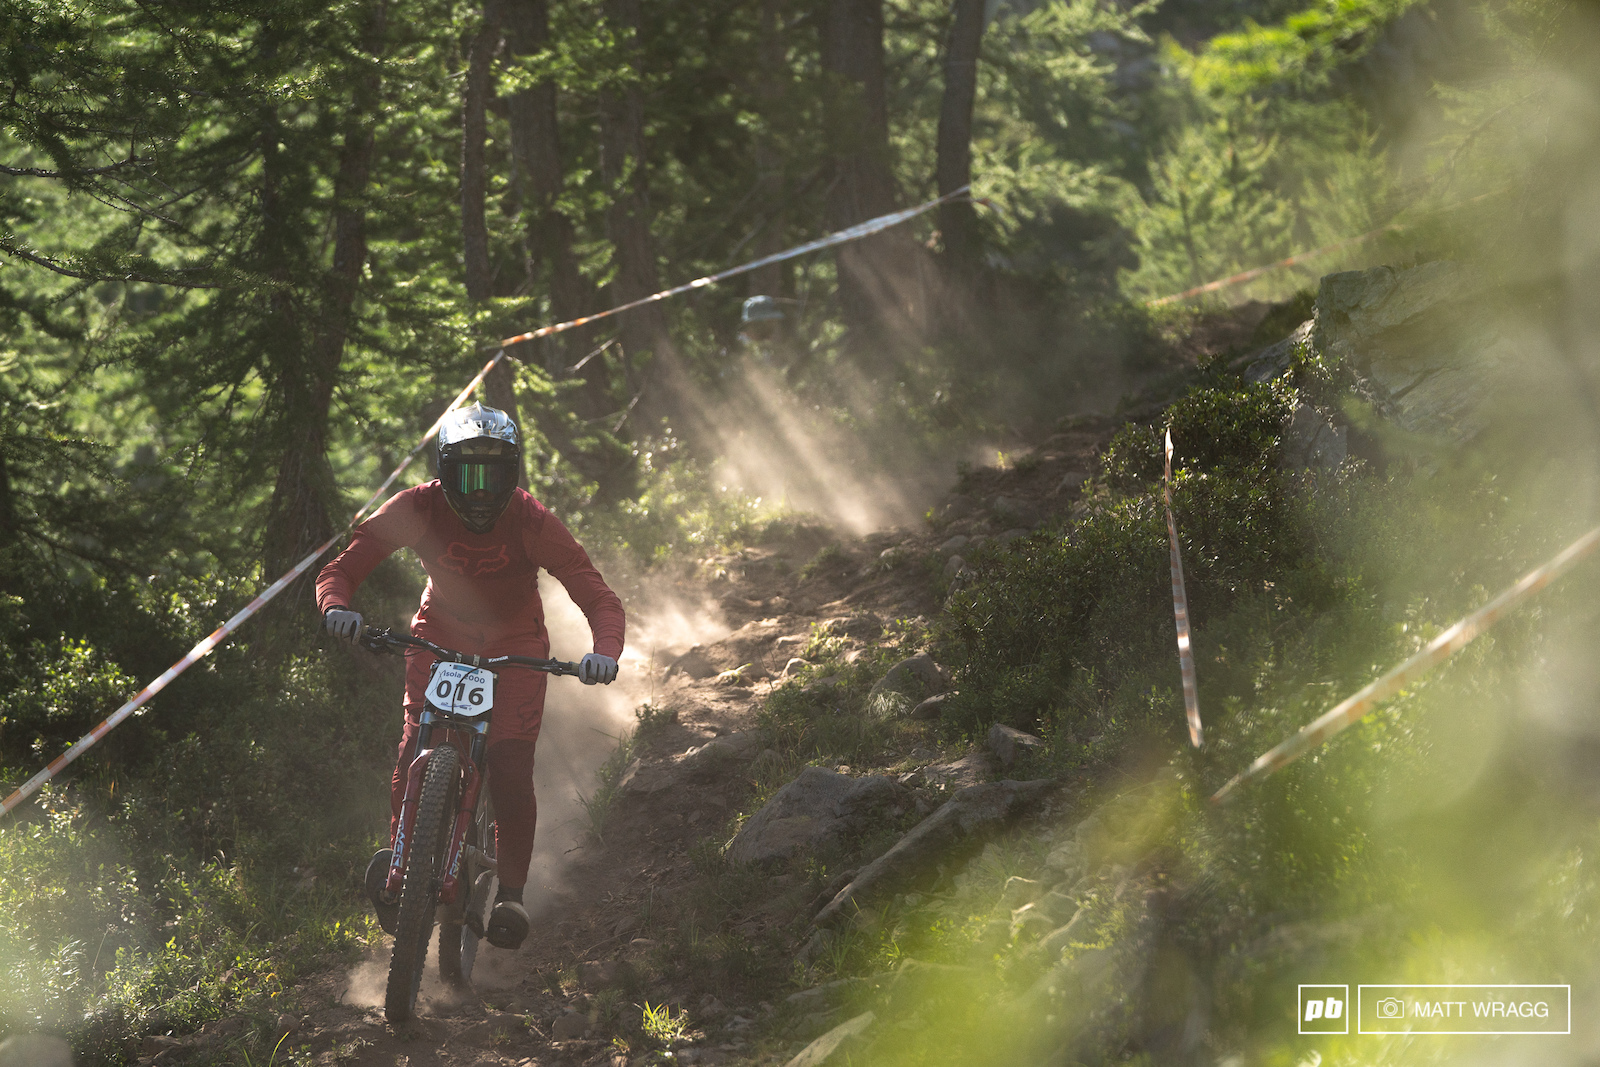 Tristan Belen kicking up dust amongst the trees.